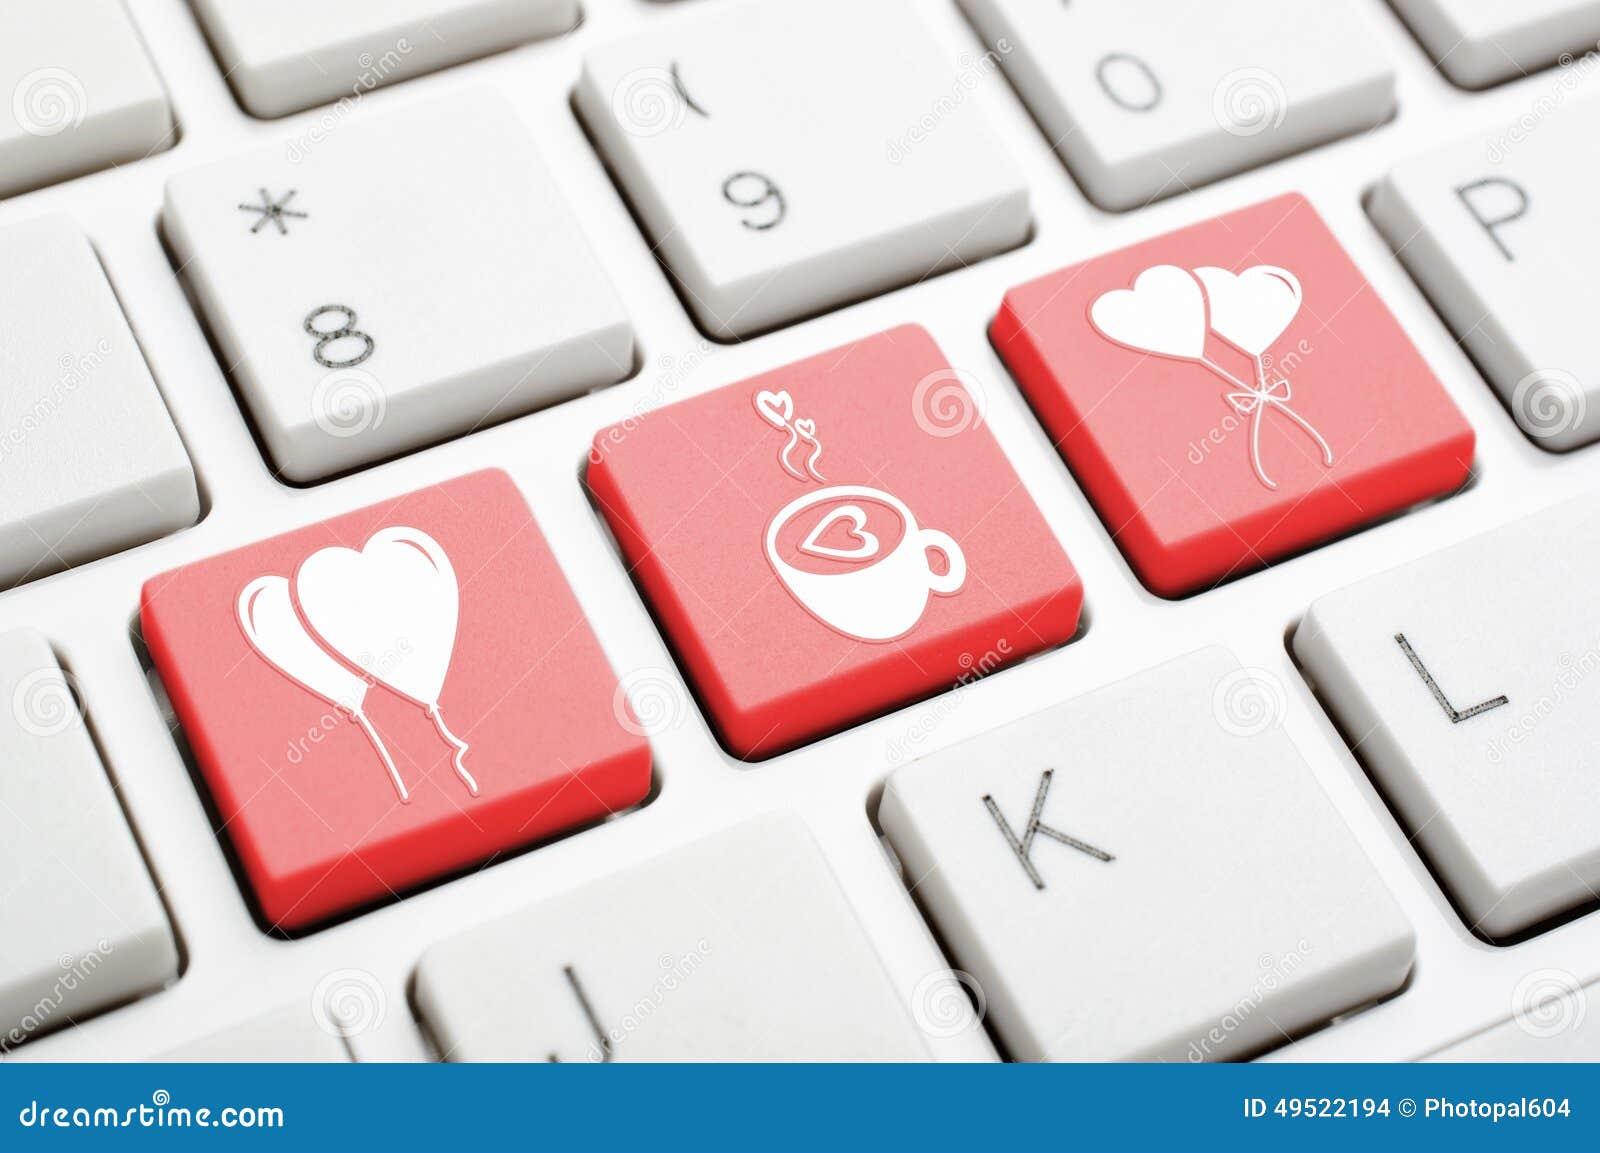 Love Symbol Key On Keyboard Stock Photo - Image of keypad, computer: 49522194